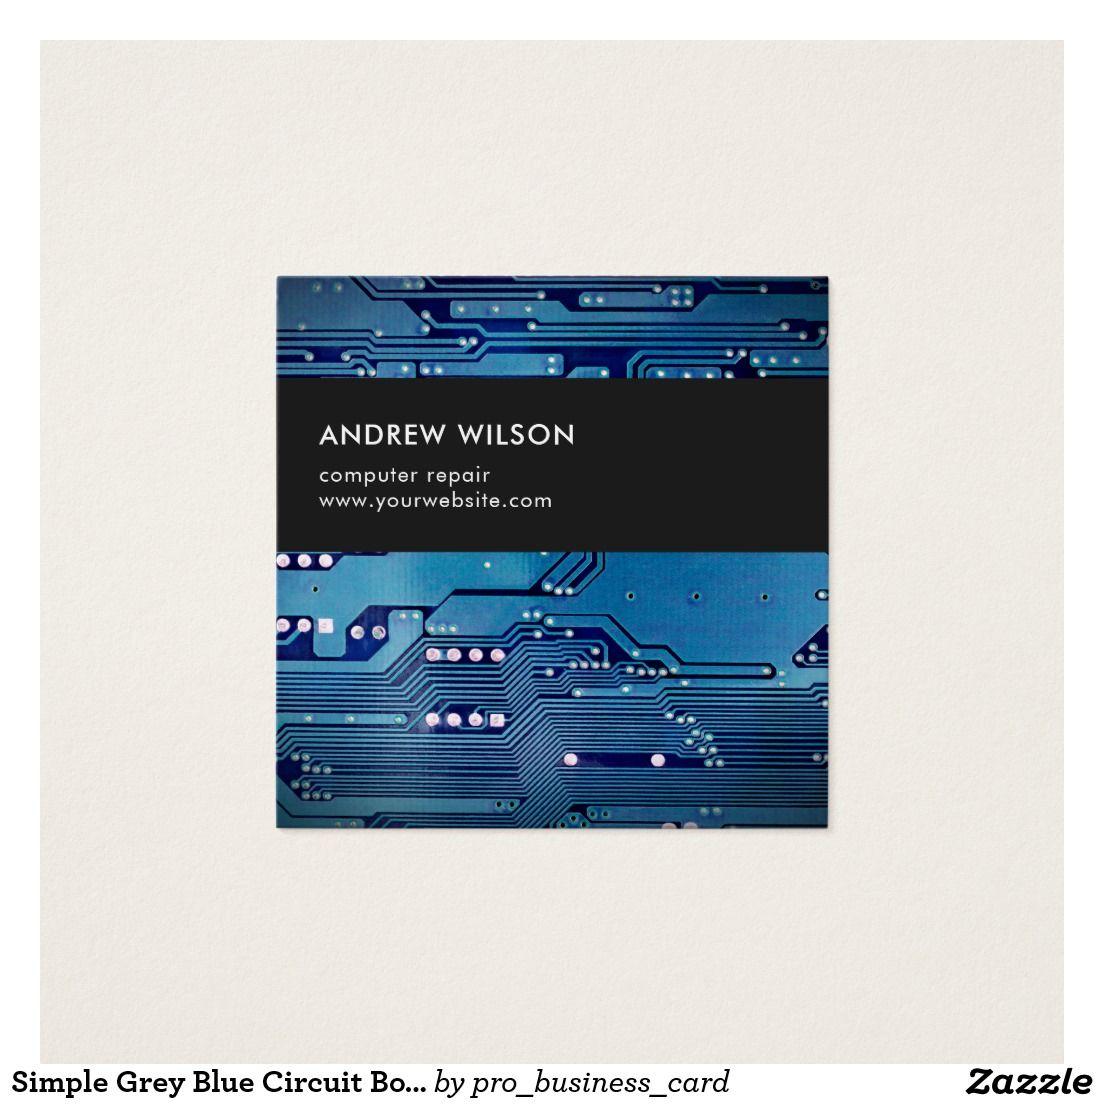 Simple Grey Blue Circuit Board Computer Repair | Business Cards ...